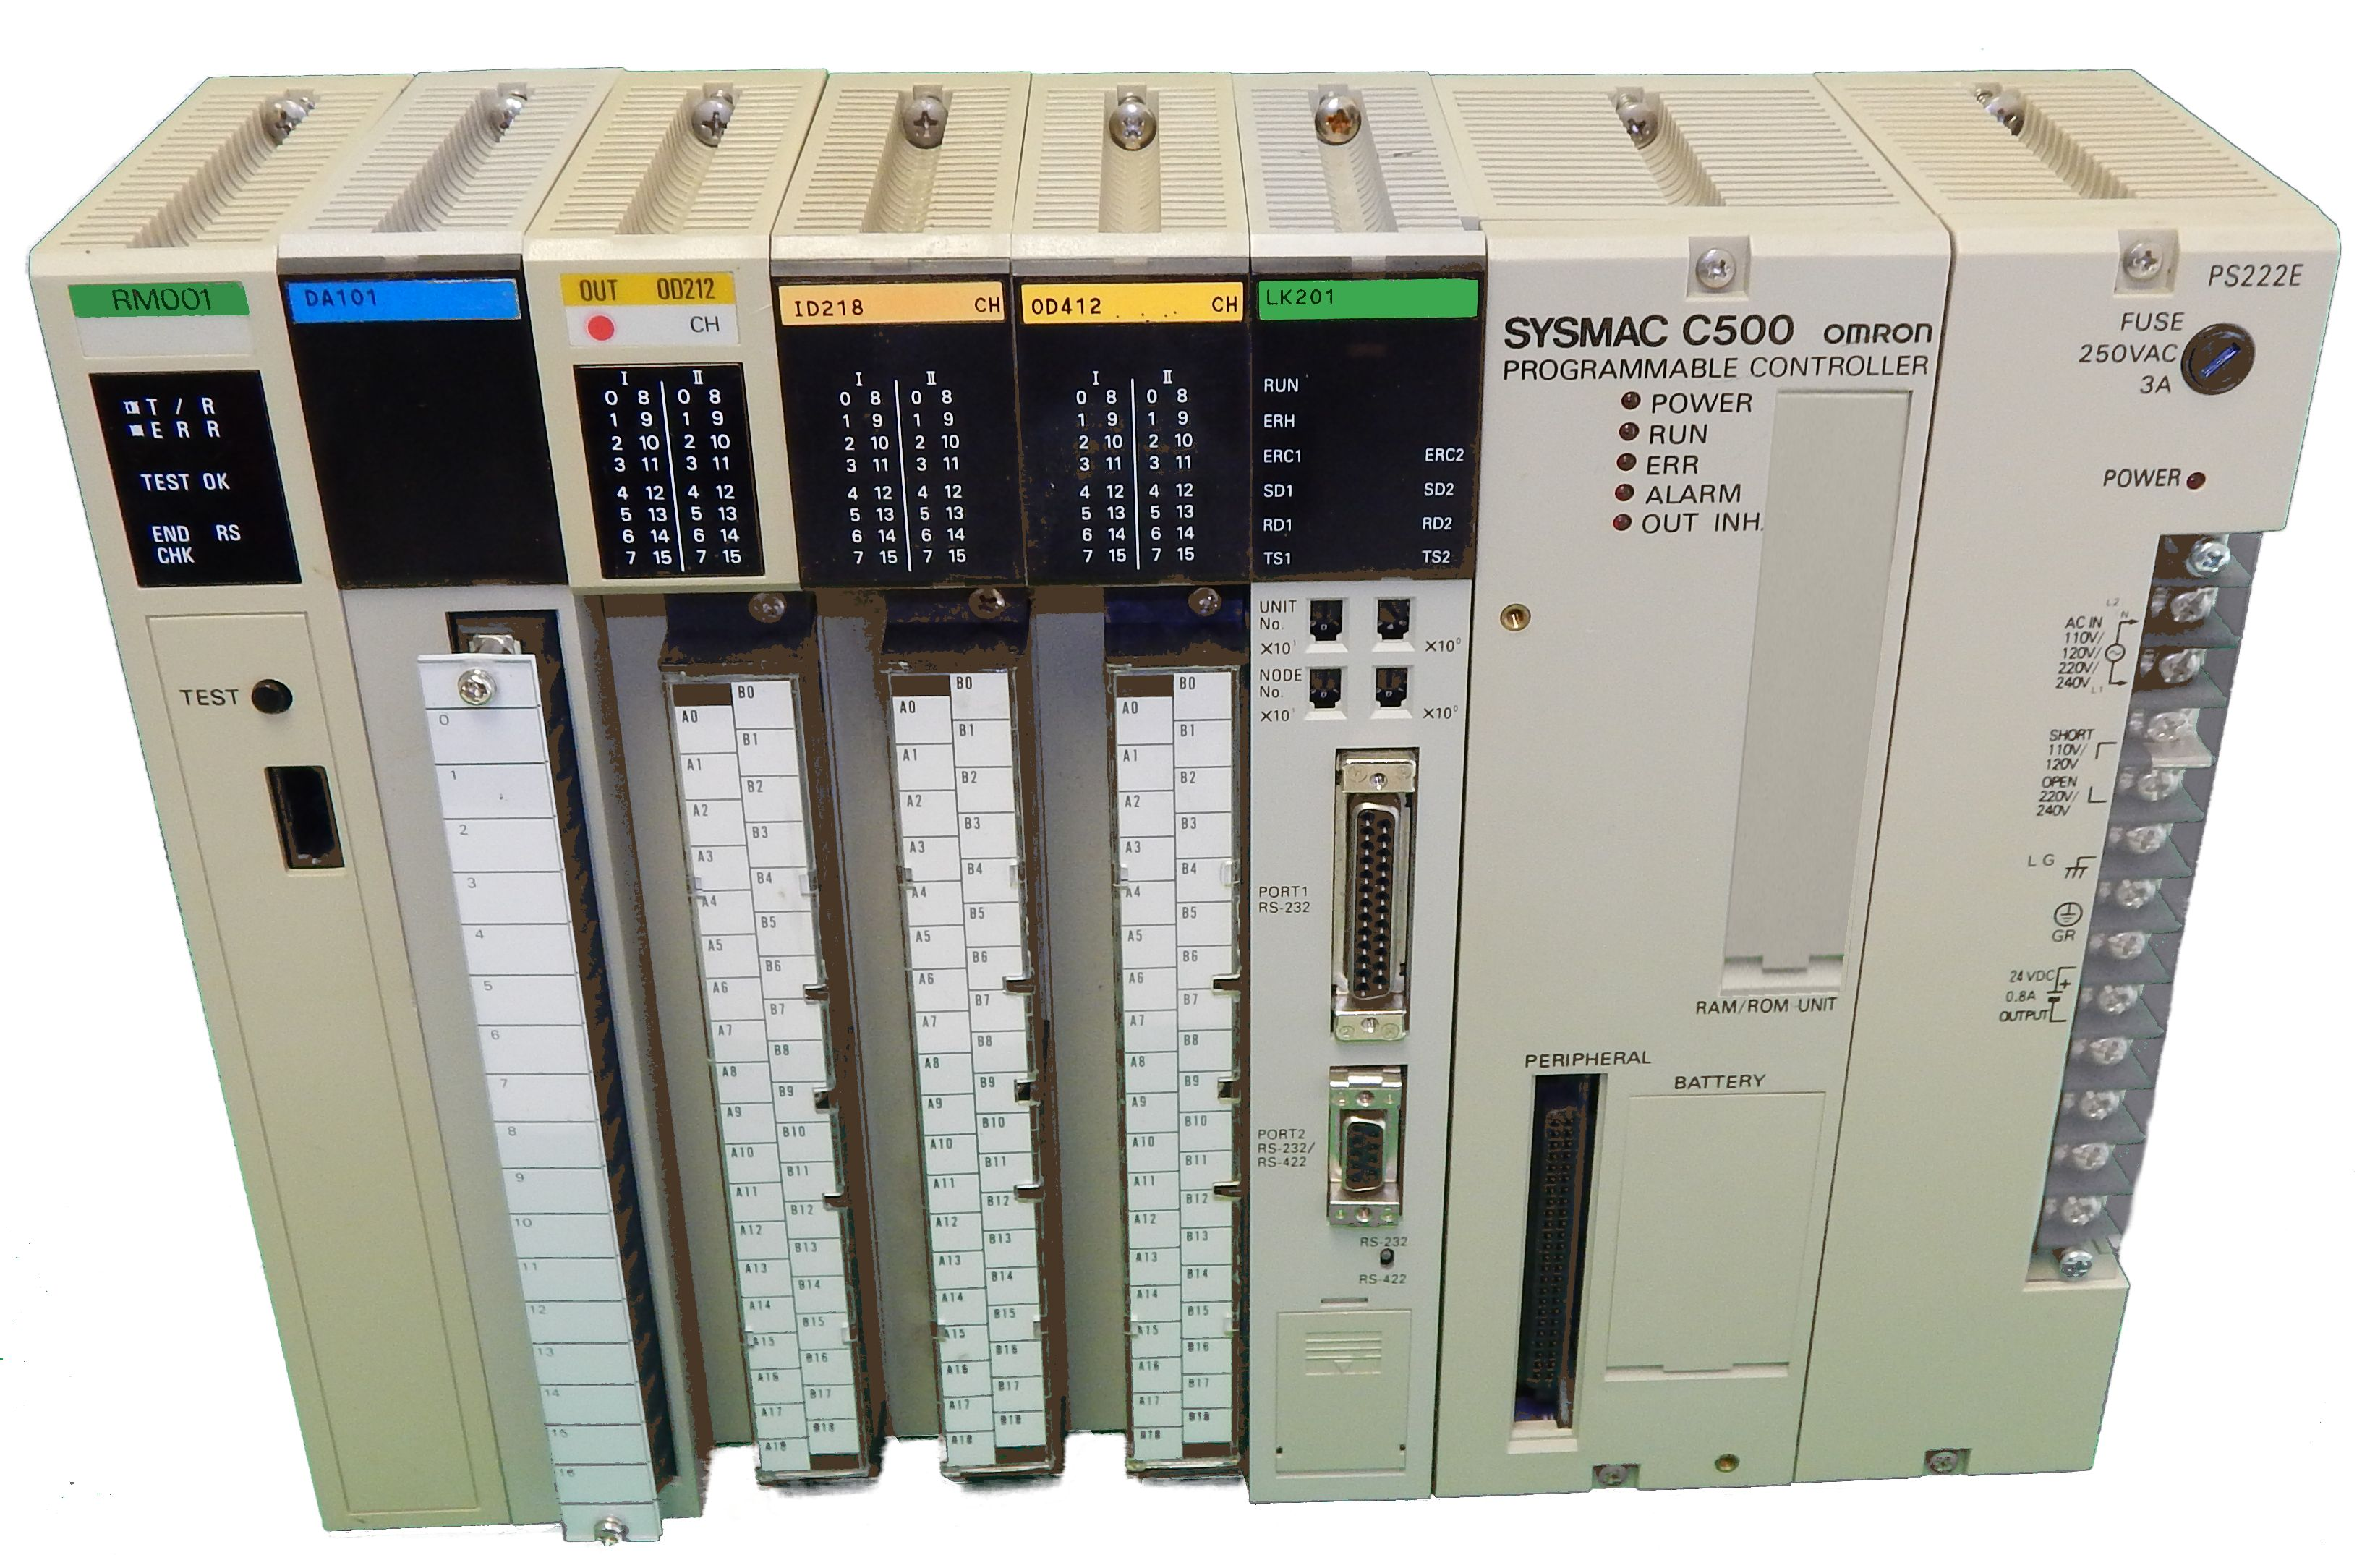 3G2C7-MC224